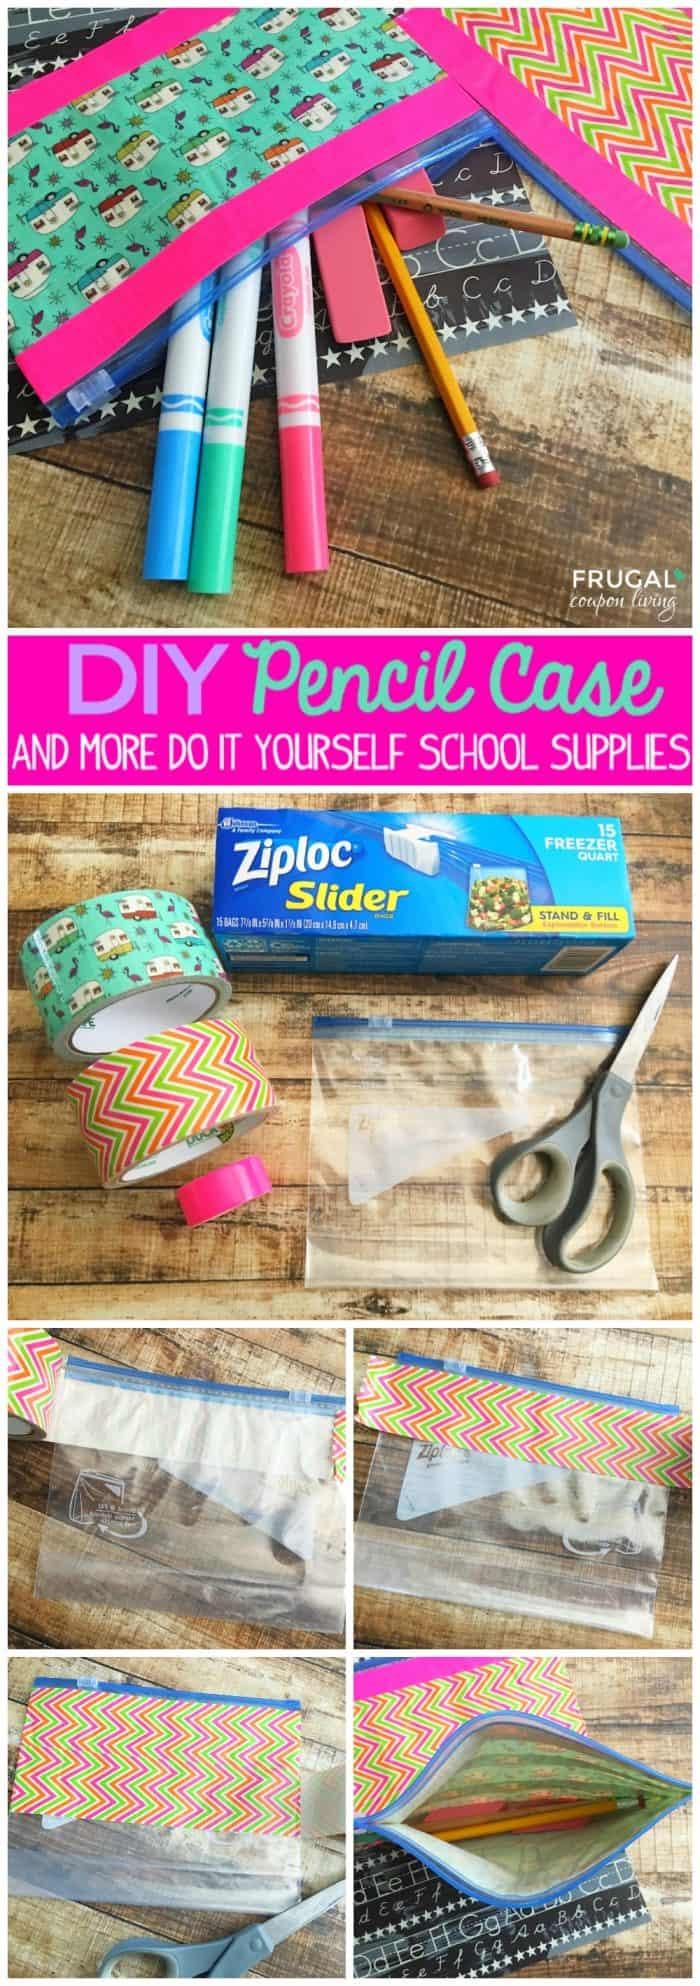 diy-pencil-case-ziploc-large-collage-frugal-coupon-living